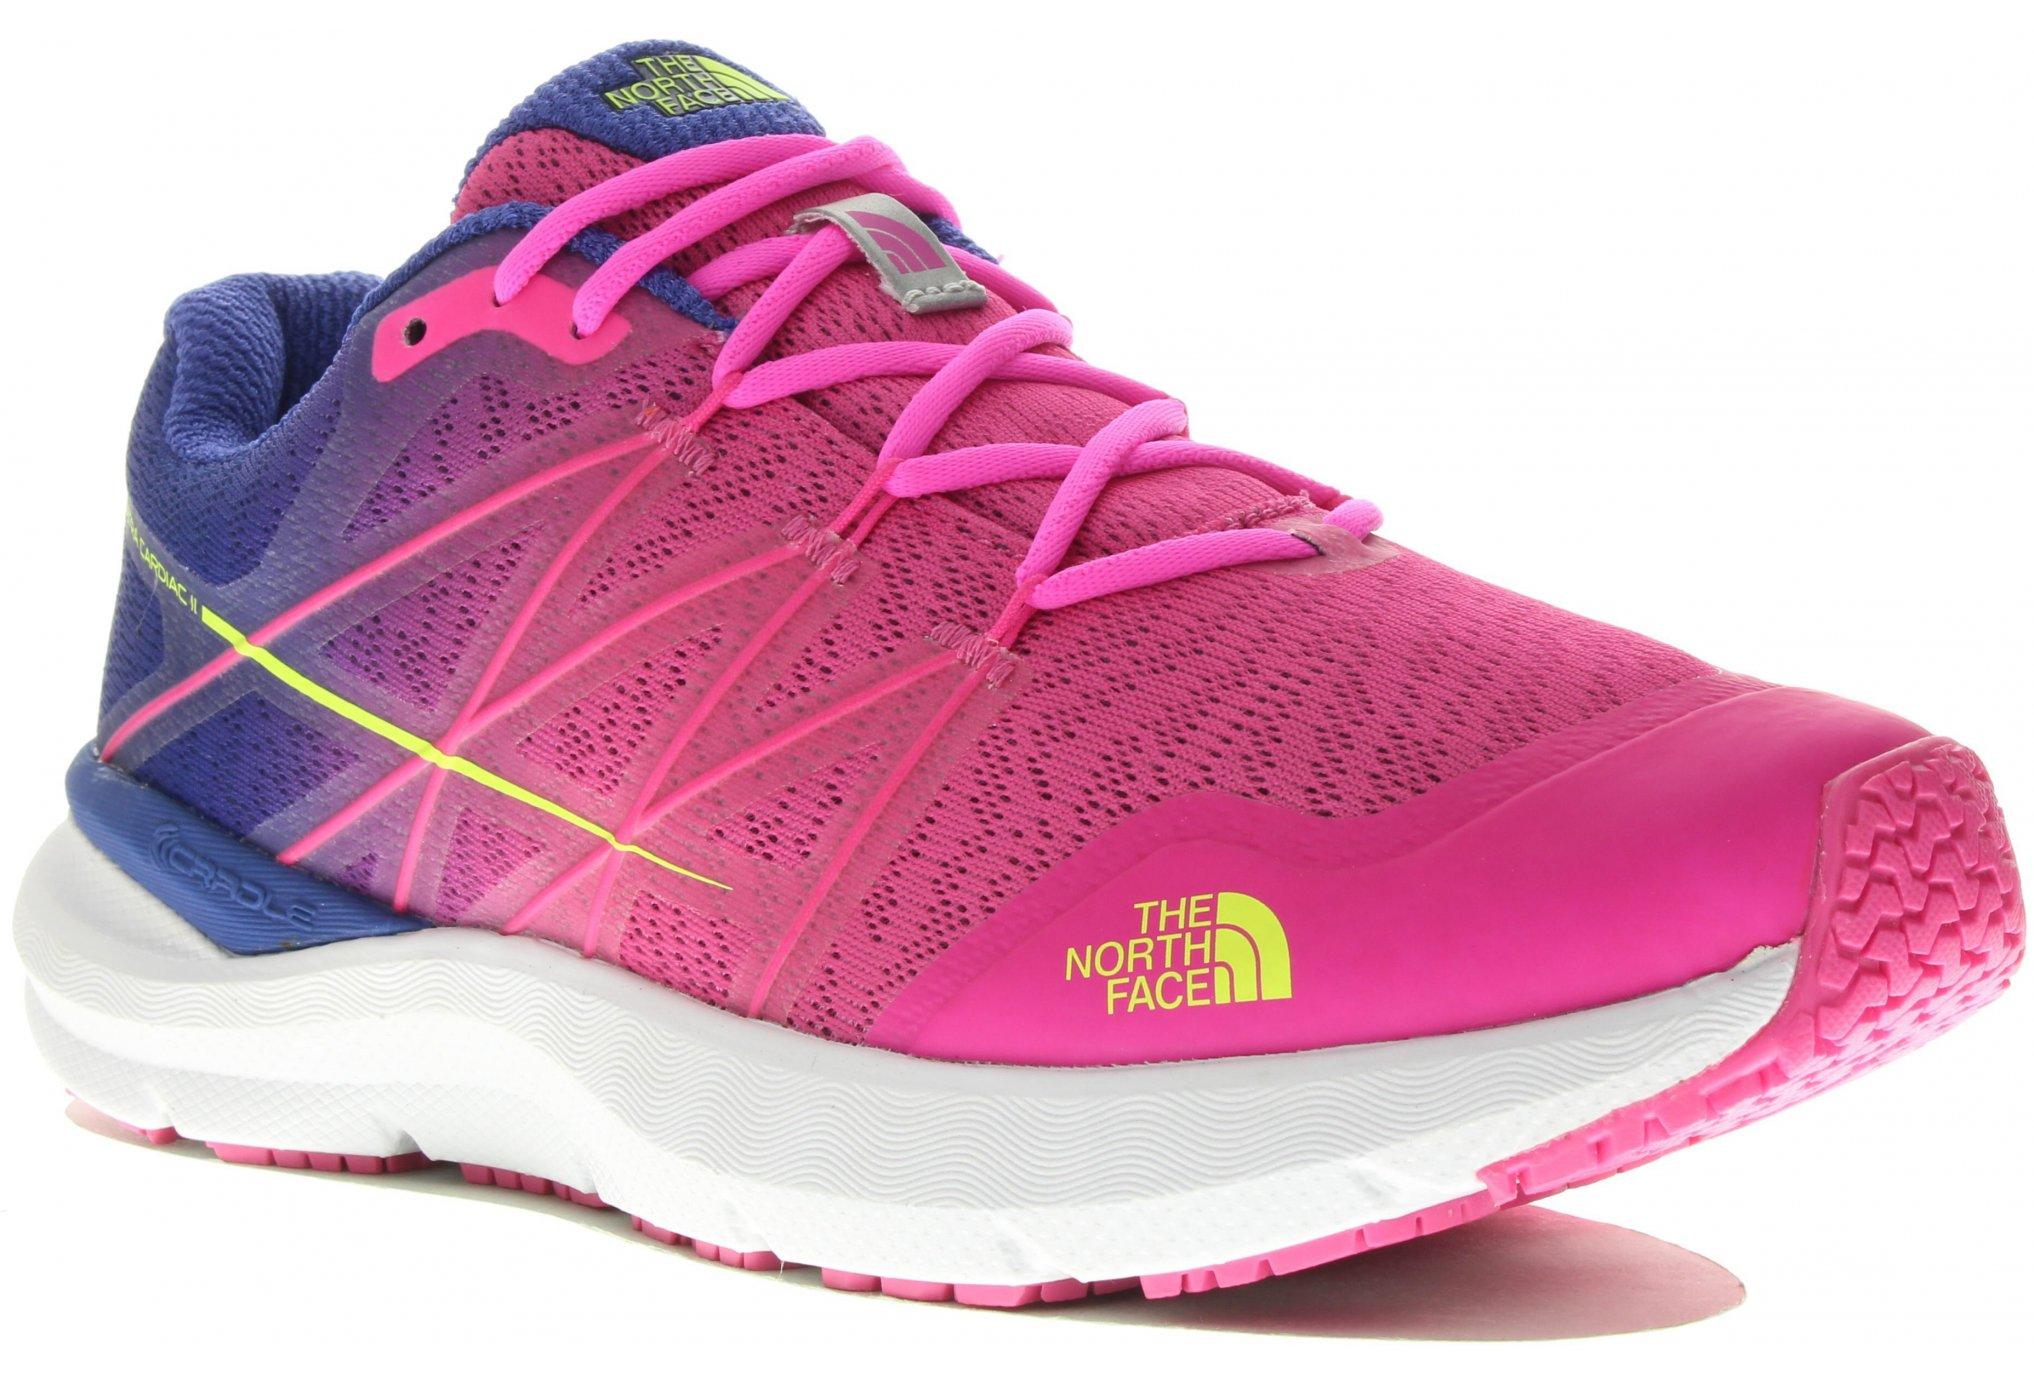 The North Face Ultra Cardiac II W Diététique Chaussures femme